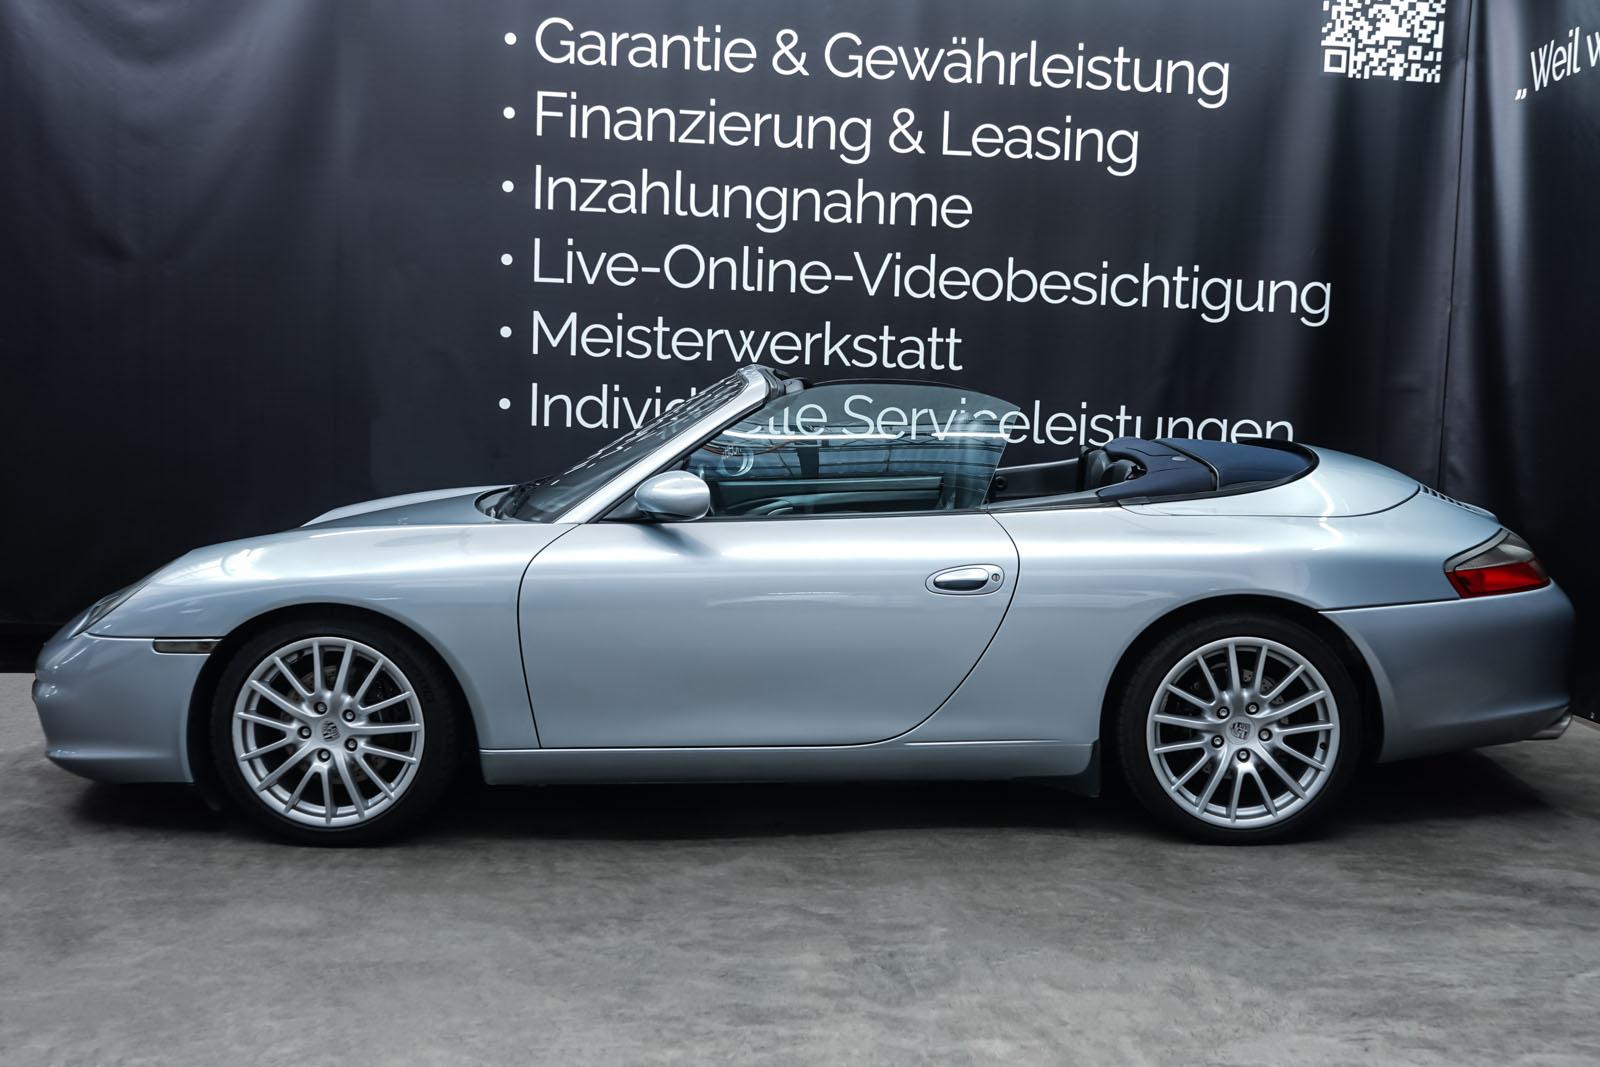 Porsche_996_Cabrio_Silber_Dunkelblau_POR-1724_6_w